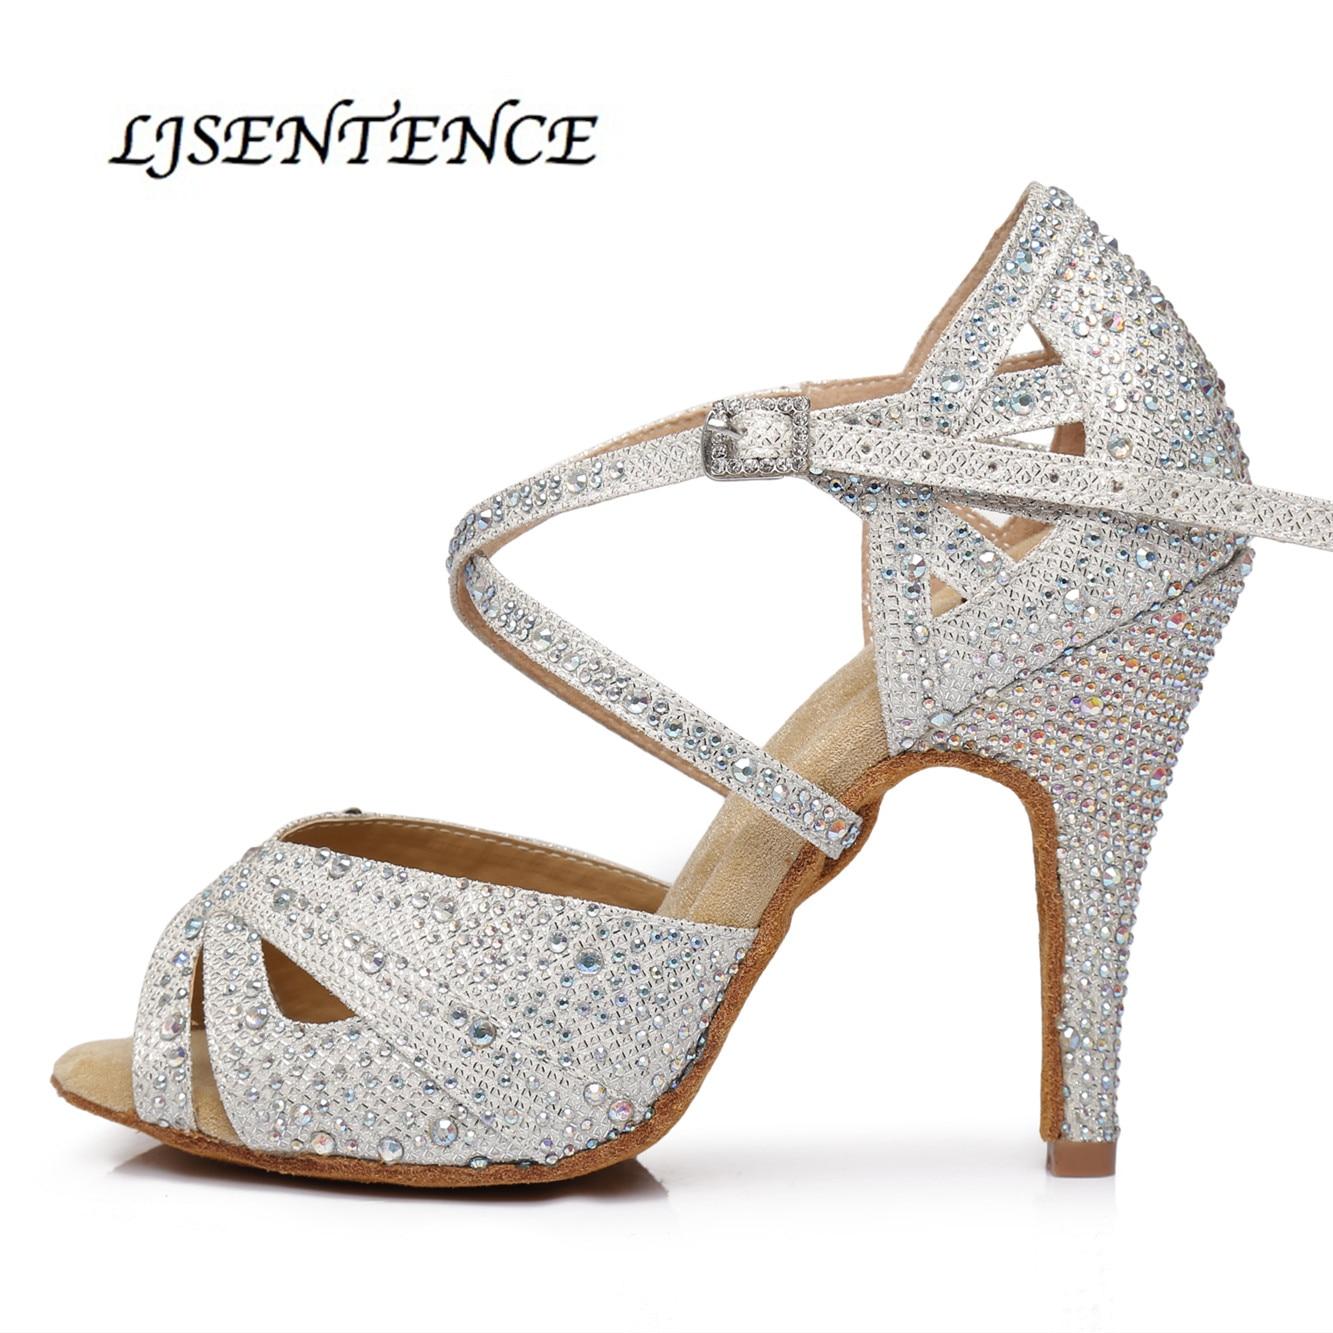 Latin Dance Shoes Woman Fabric Texture Rhinestones Salsa Shoes 10cm 9cm Heels Tango Bachata Kizomba Training Perform Shoes New